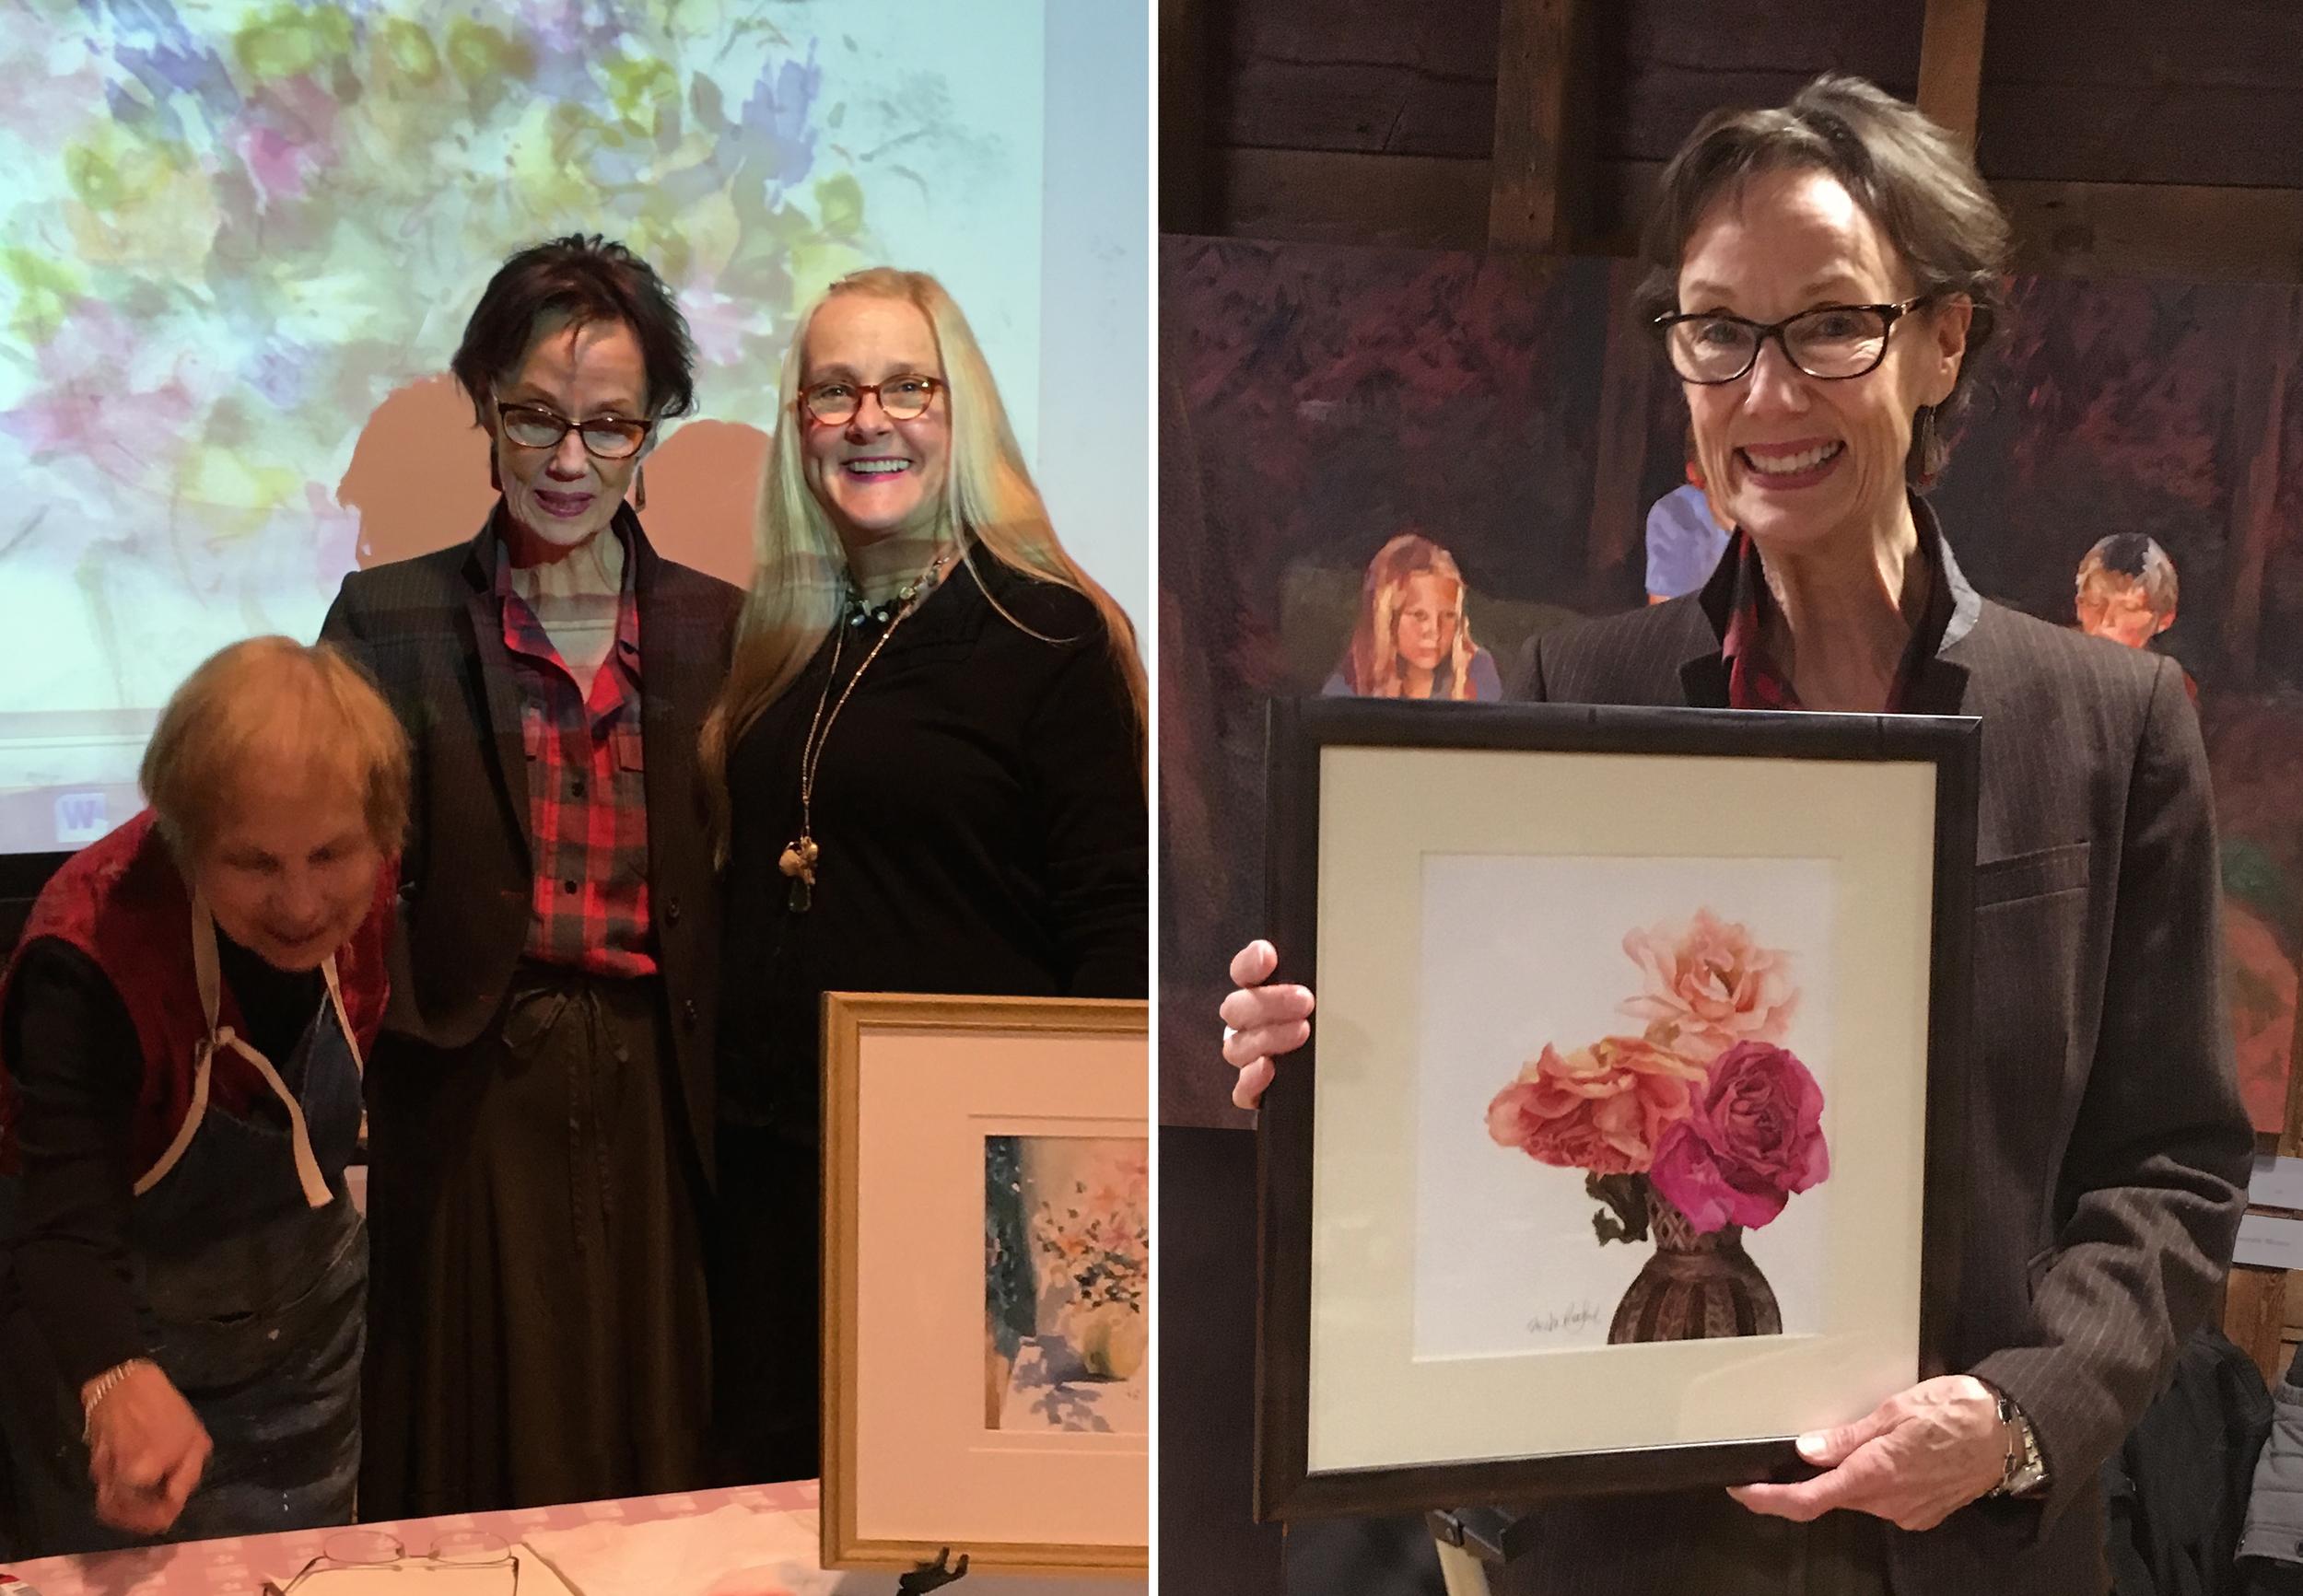 Photo Left Lucy Graves-McVicker, Artist Sheila Redford, Artist Ireen Kudra-Miller, Princeton University Art Museum Docent  Photo Right Sheila Redford, Artist